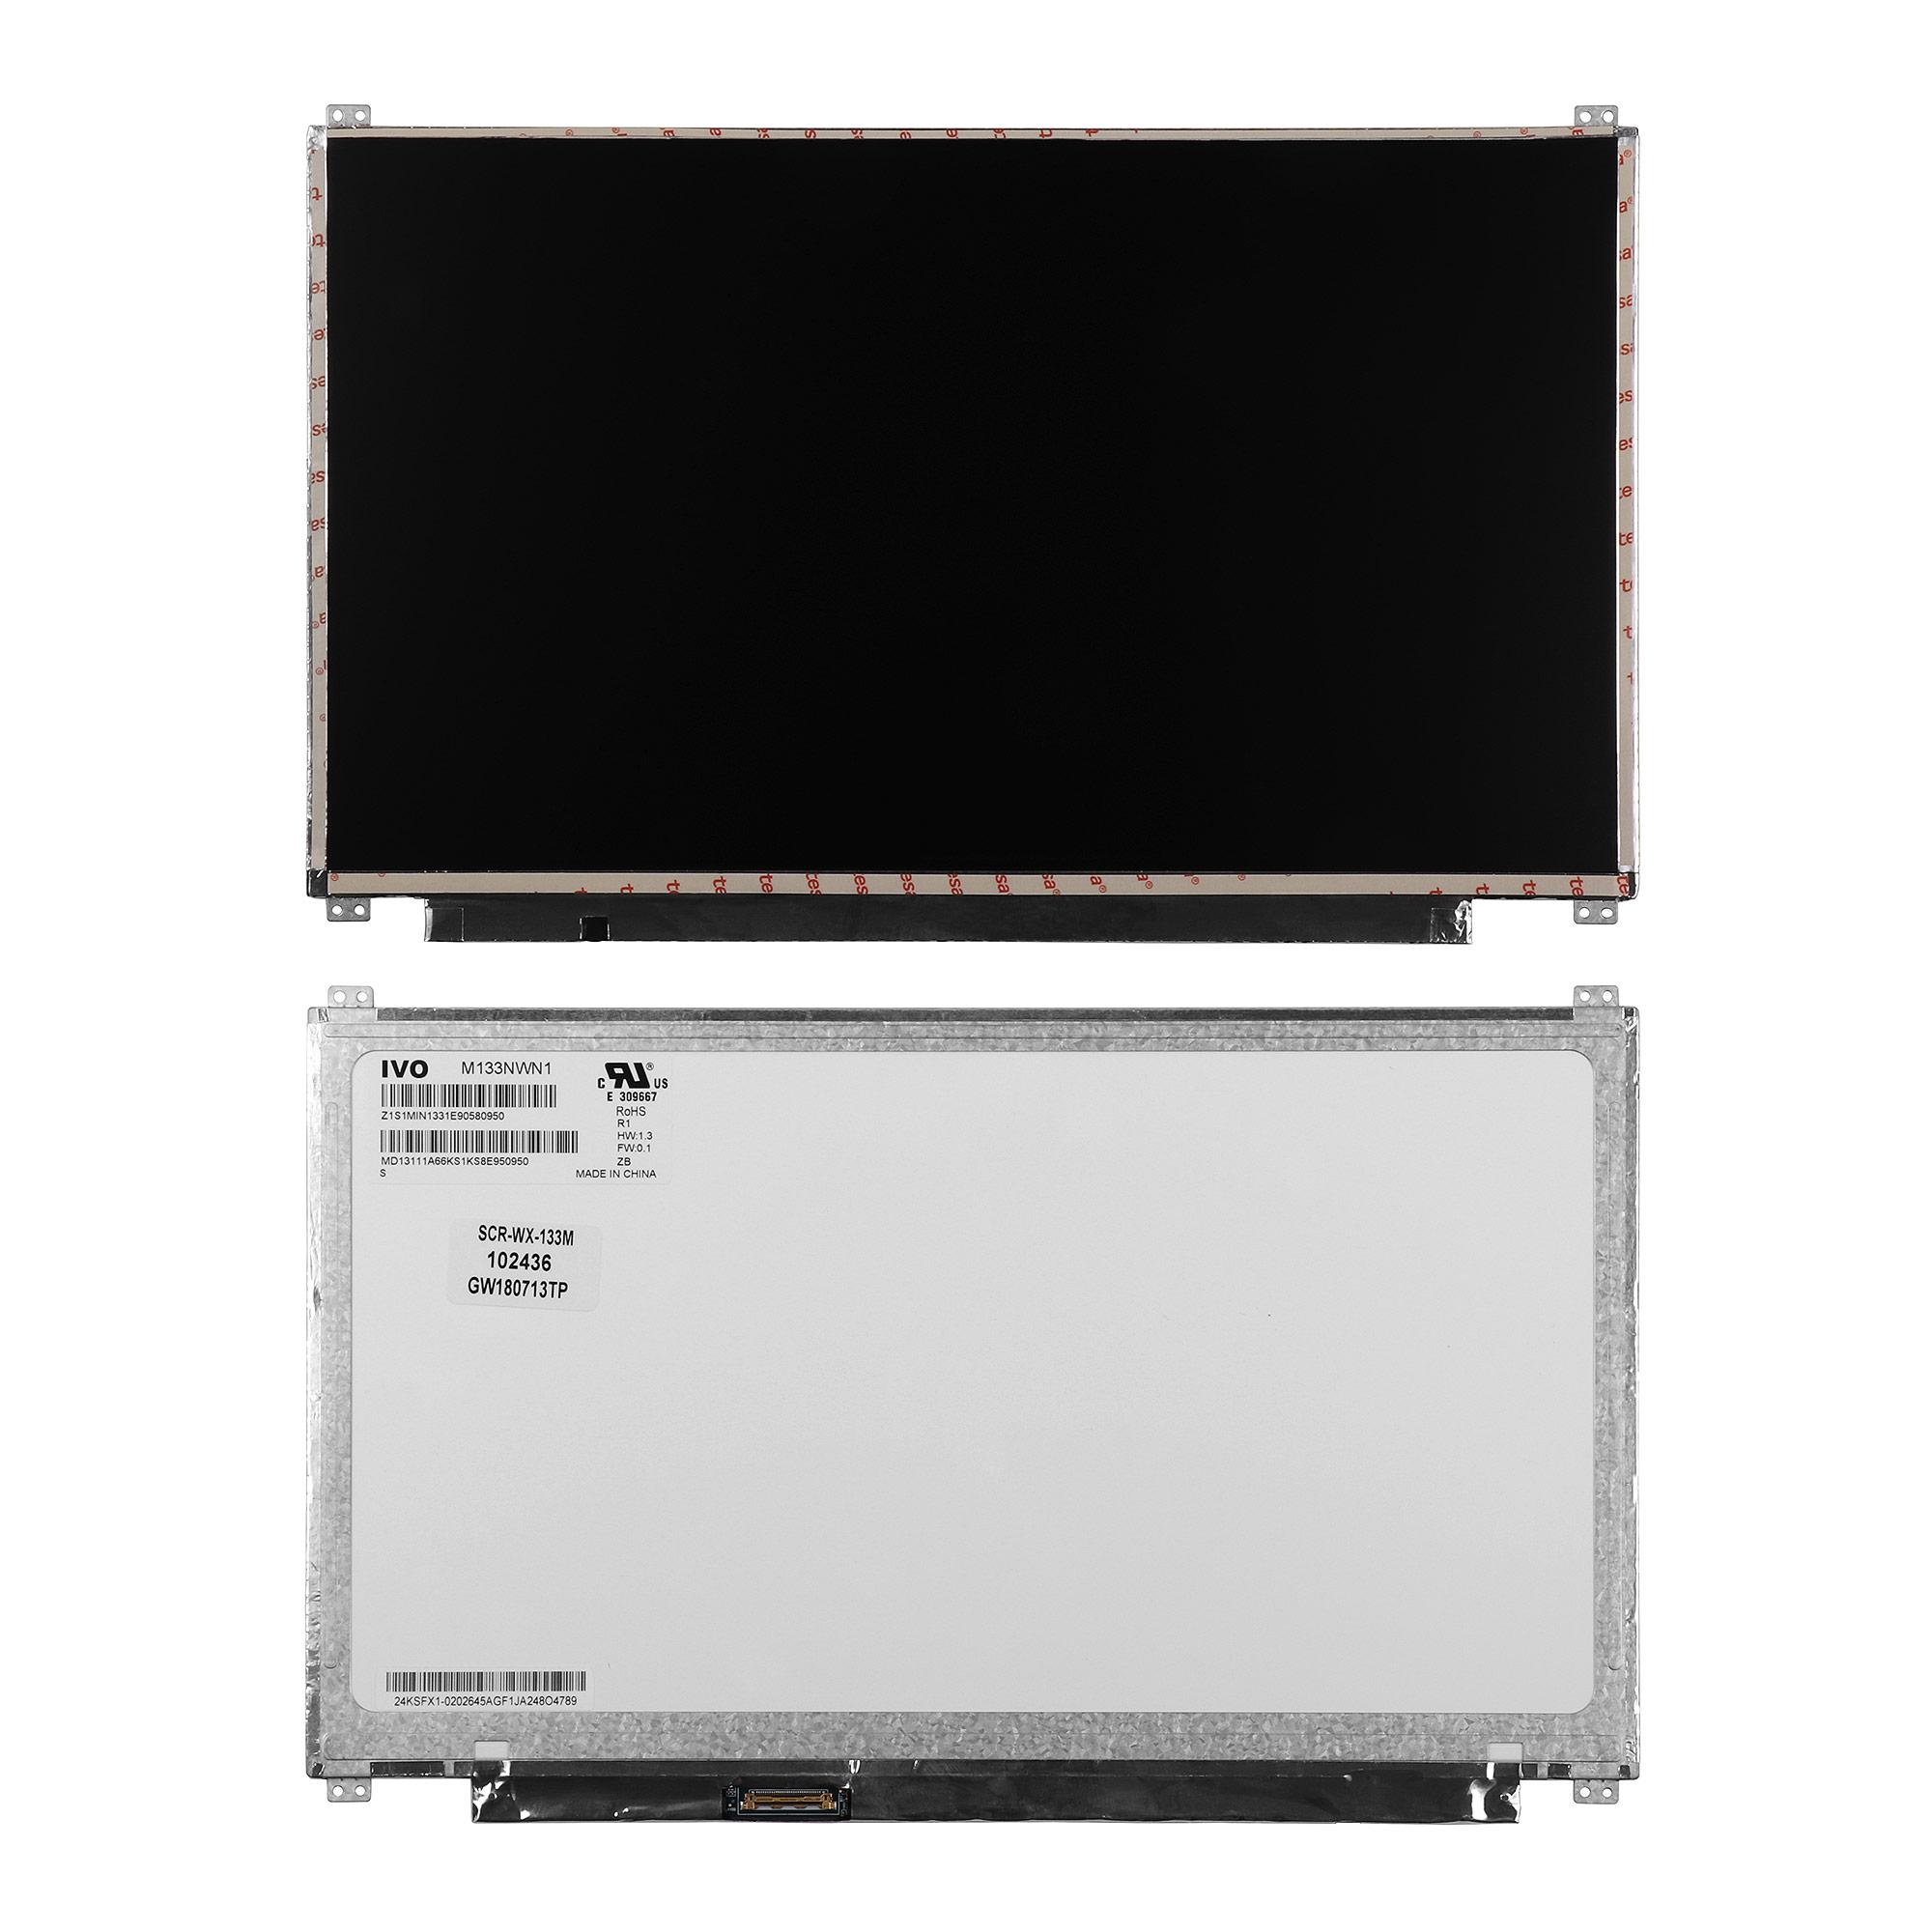 Запчасти для ремонта теле, видео, аудио 13.3 1366x768 WXGA HD 30 pin Slim LED крепления сверху/снизу (уши). Разъем слева. Матовая. PN: M133NWN1.